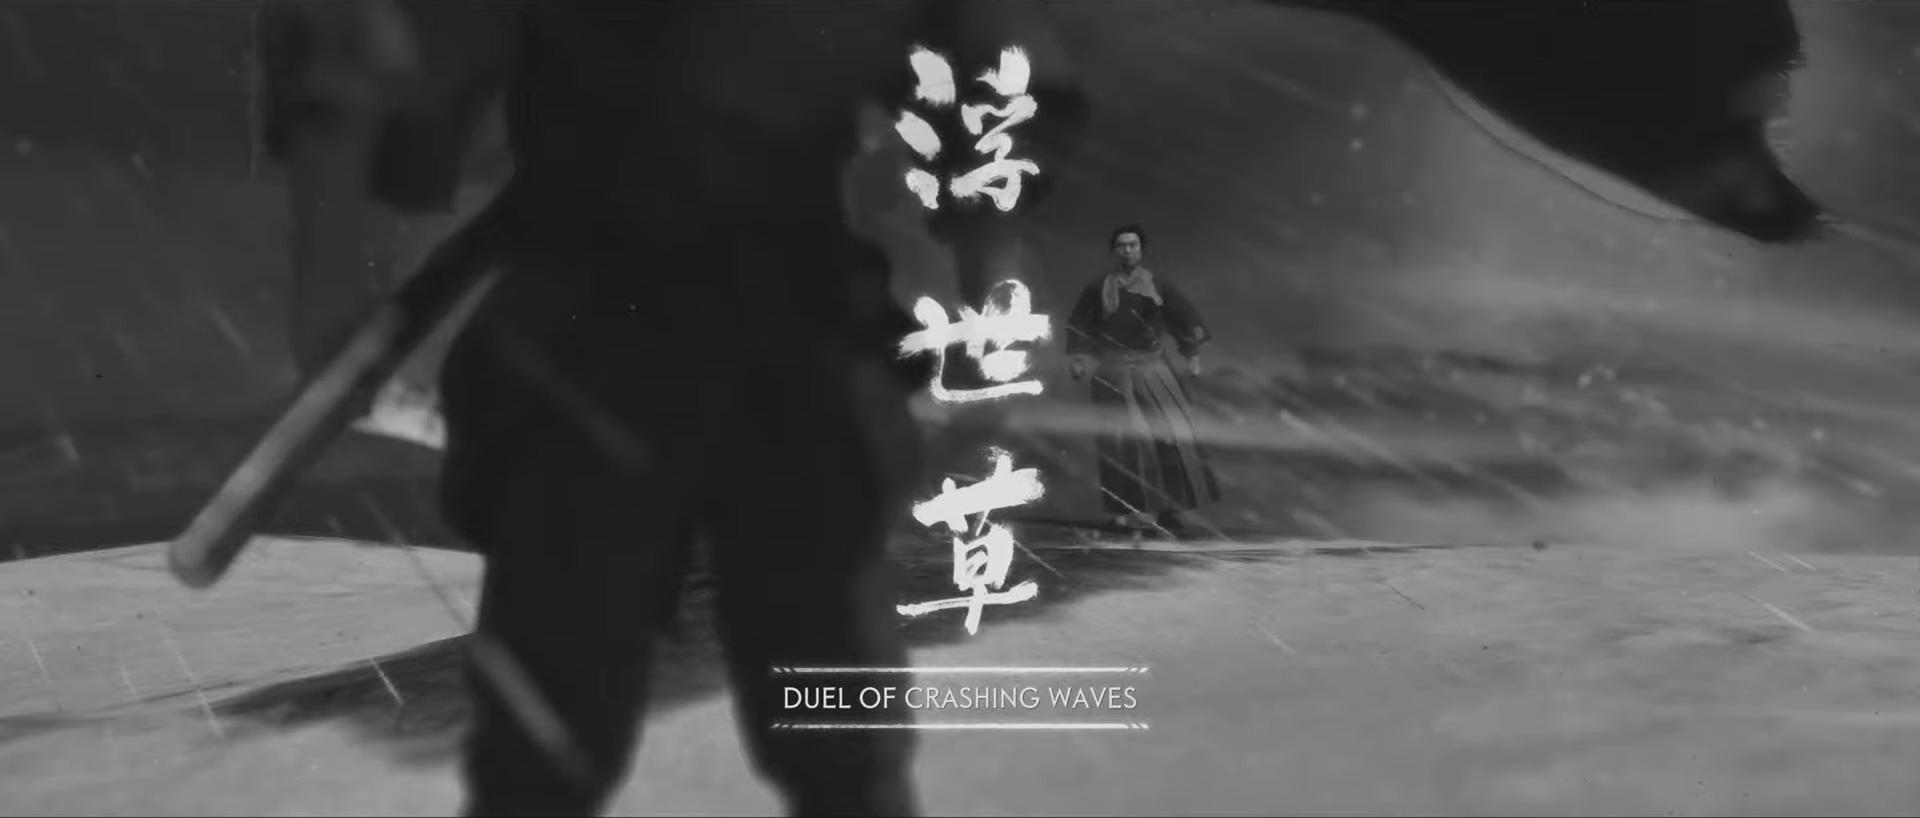 Ghost of Tsushima Duel of the Crashing Waves